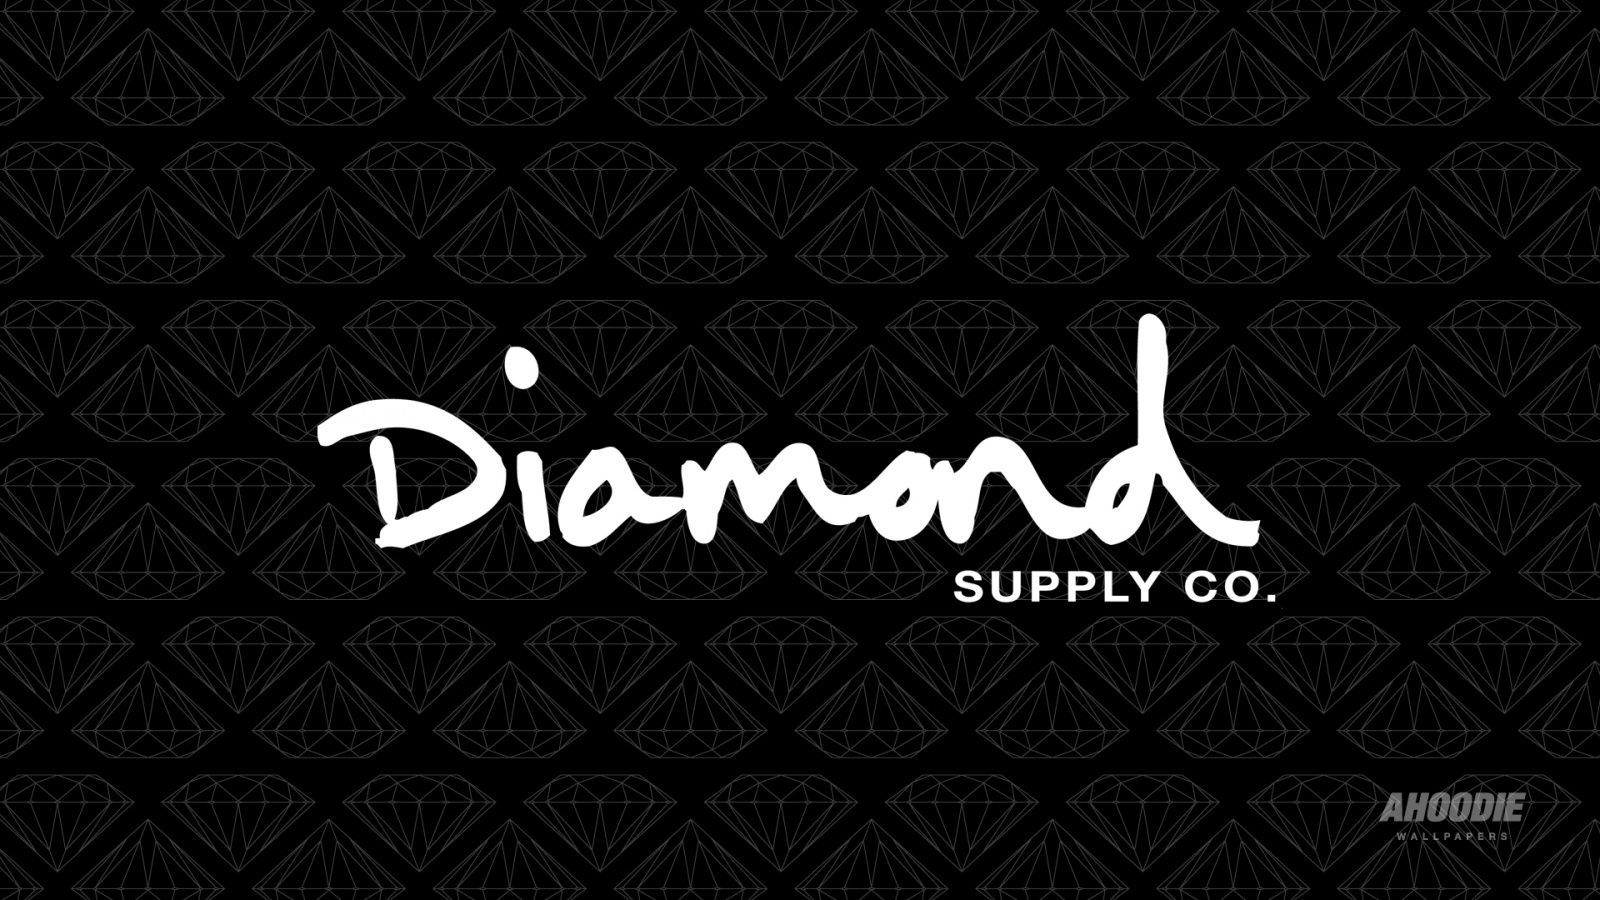 36 Best Free Diamond Supply Co Ahoodie Wallpapers